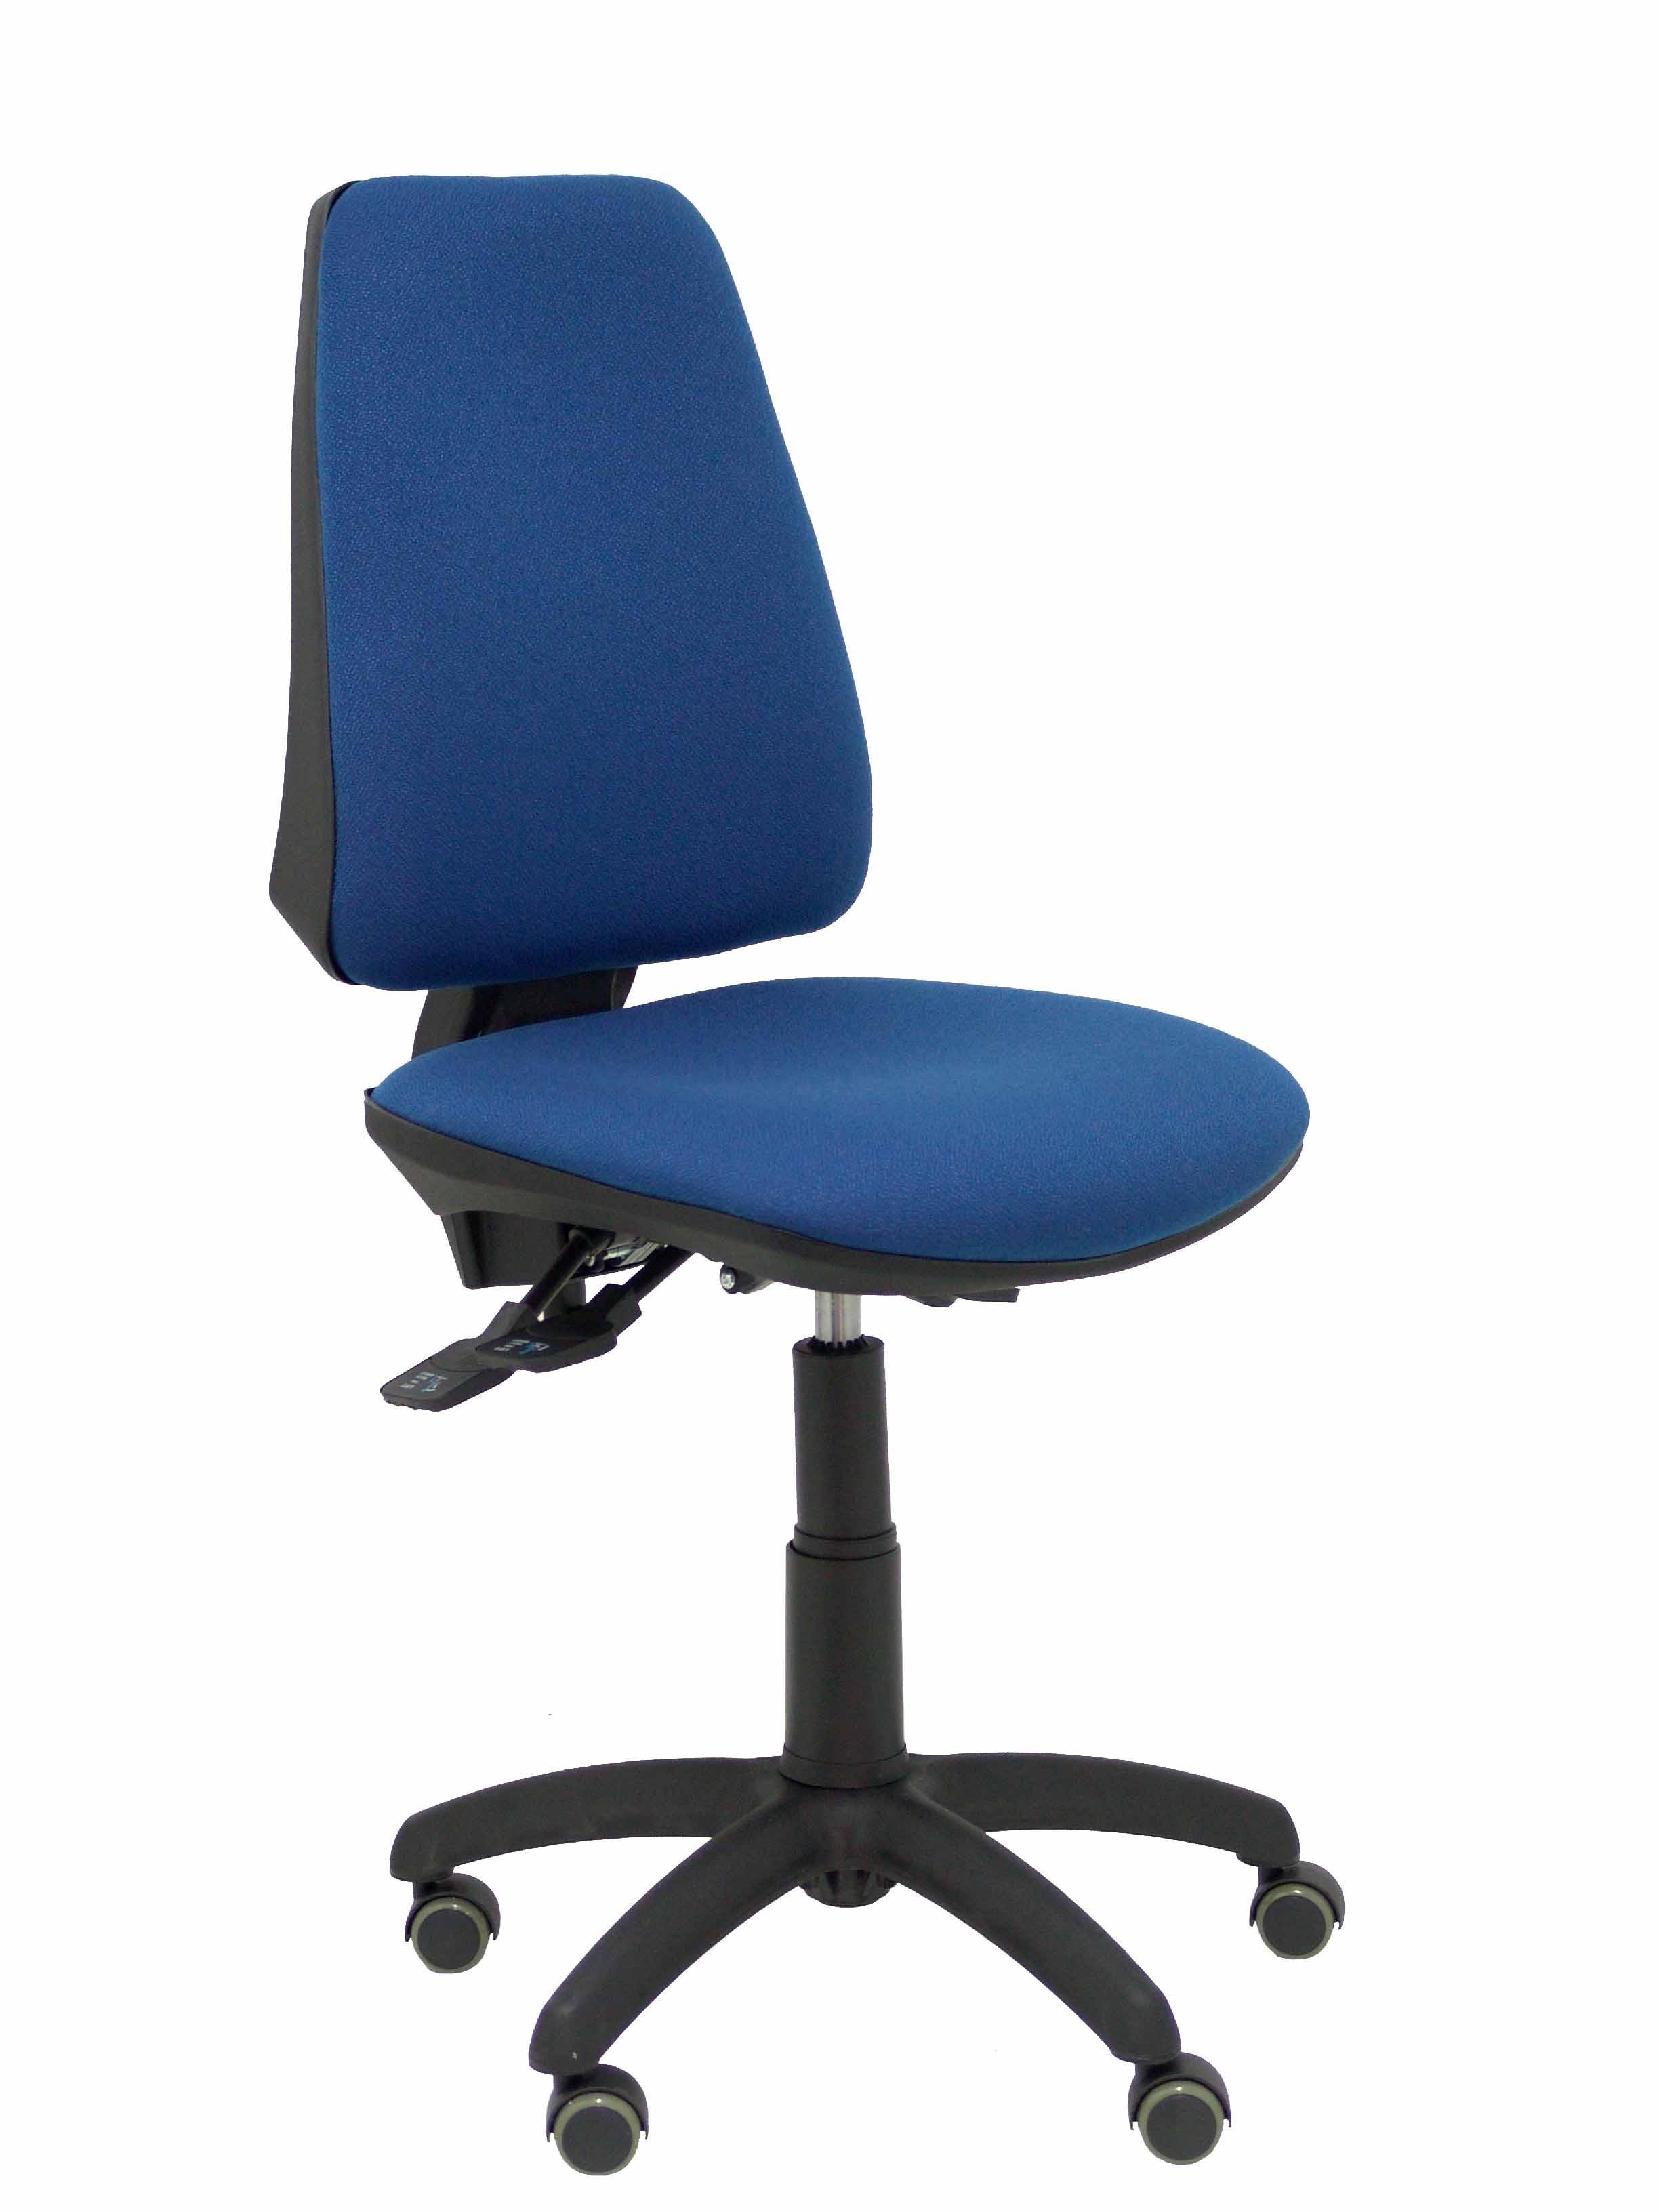 Elche S bali sedia bali blu navy parquet ruote | eBay